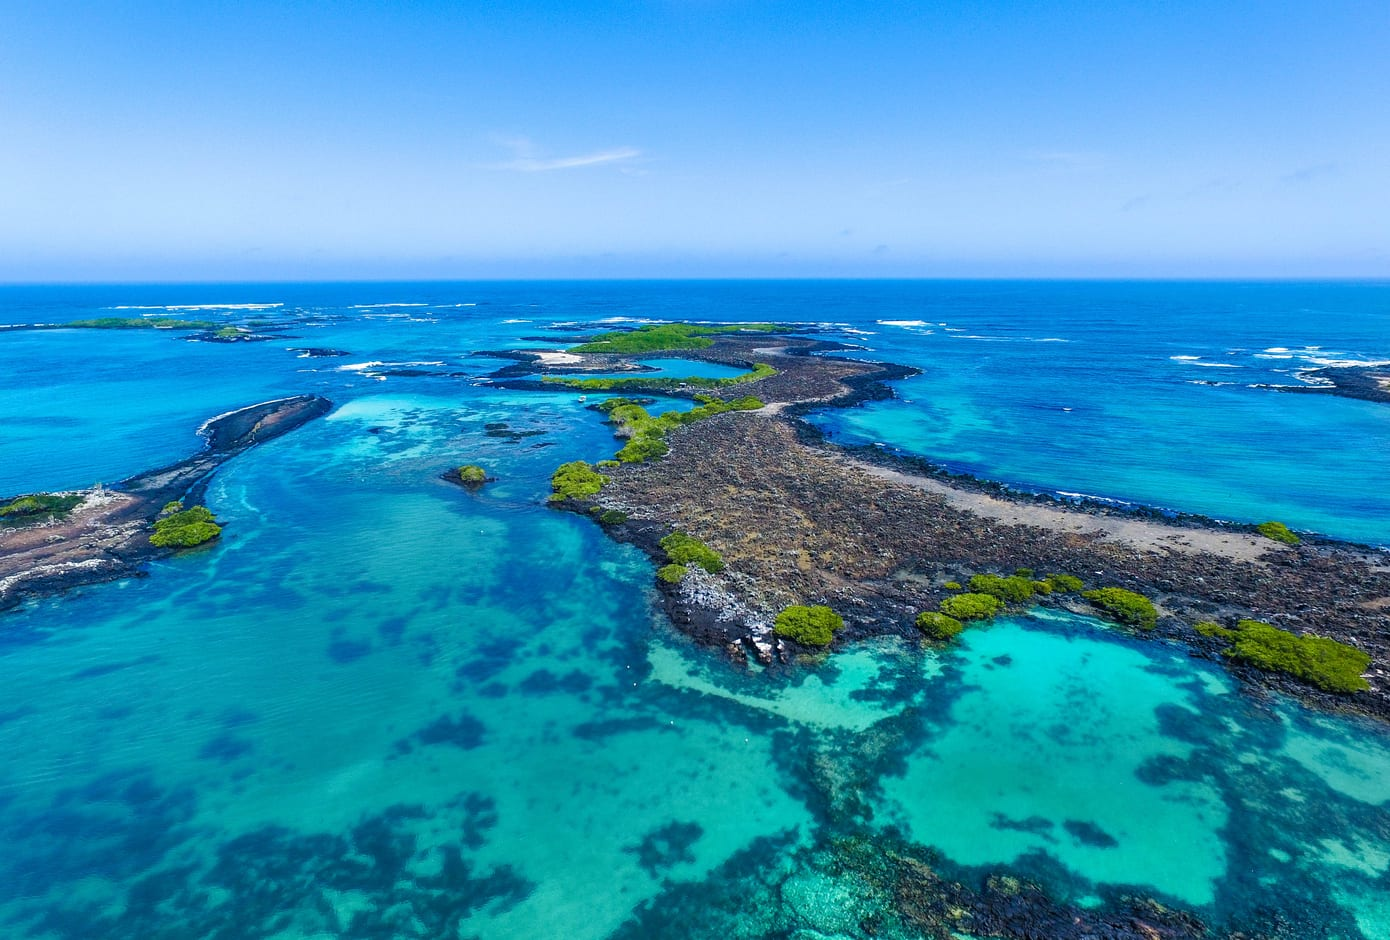 Aerial Shot of Isabela Island, in the Galápagos Archipelago, Ecuador.